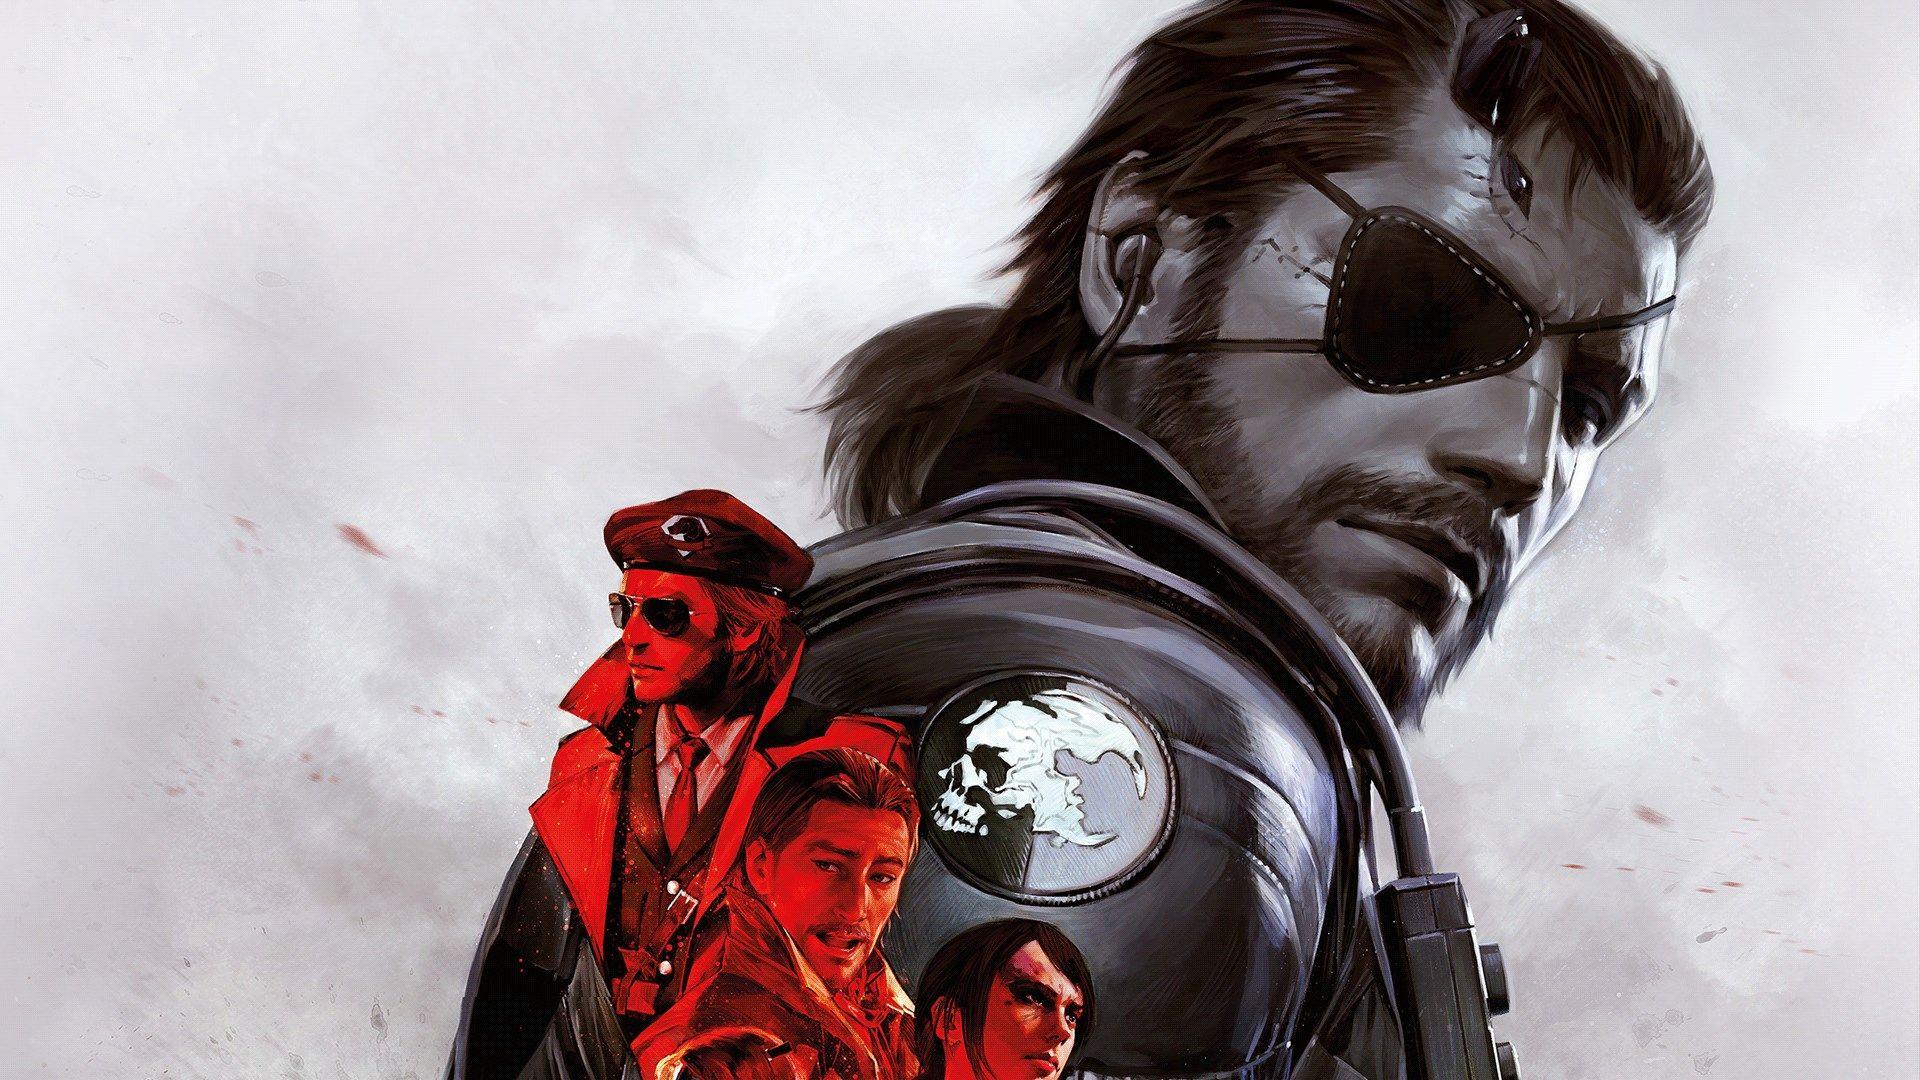 [Microsoft Store Deutschland] [XBOX] Metal Gear Solid V: The Definitive Edition Xbox One / Xbox One X / Xbox Series X / Xbox Series S